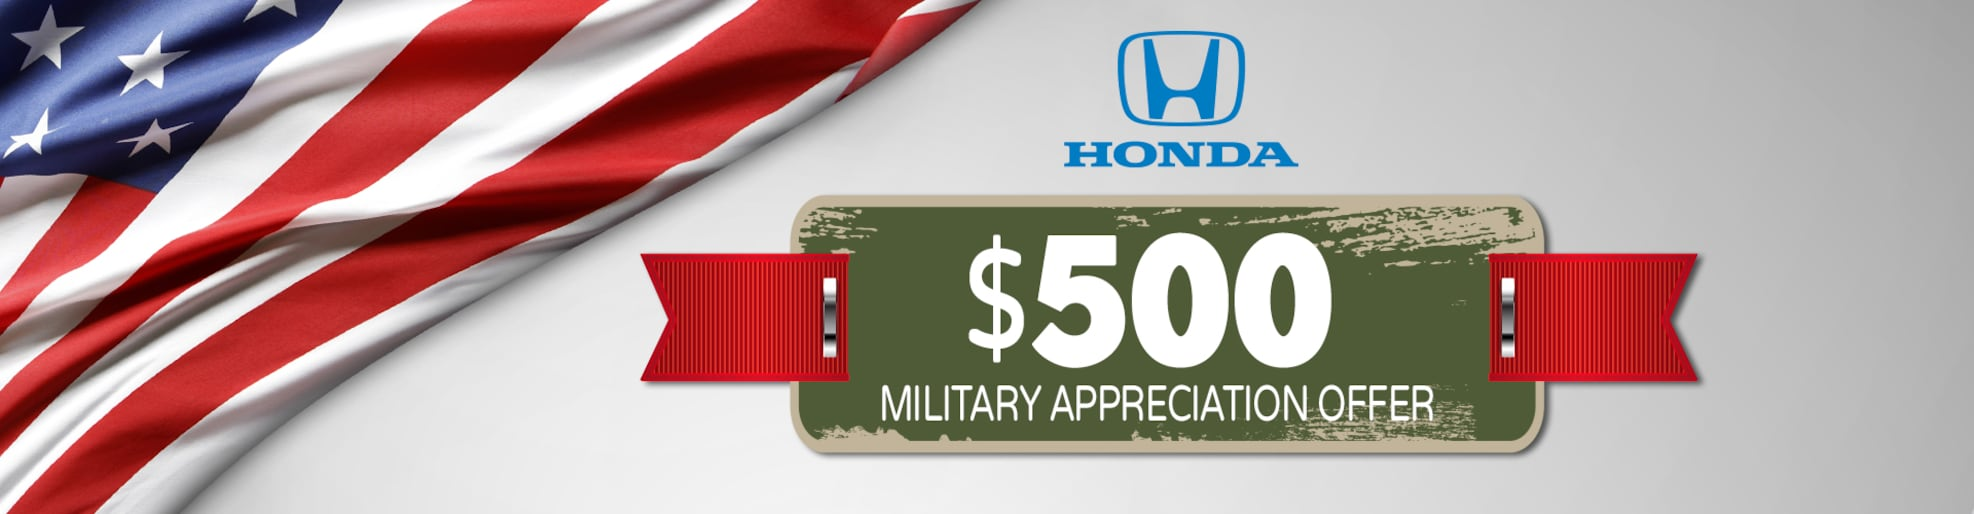 Honda Dealers Cincinnati >> Jeff Wyler Honda Dealerships New And Used Honda Dealer In